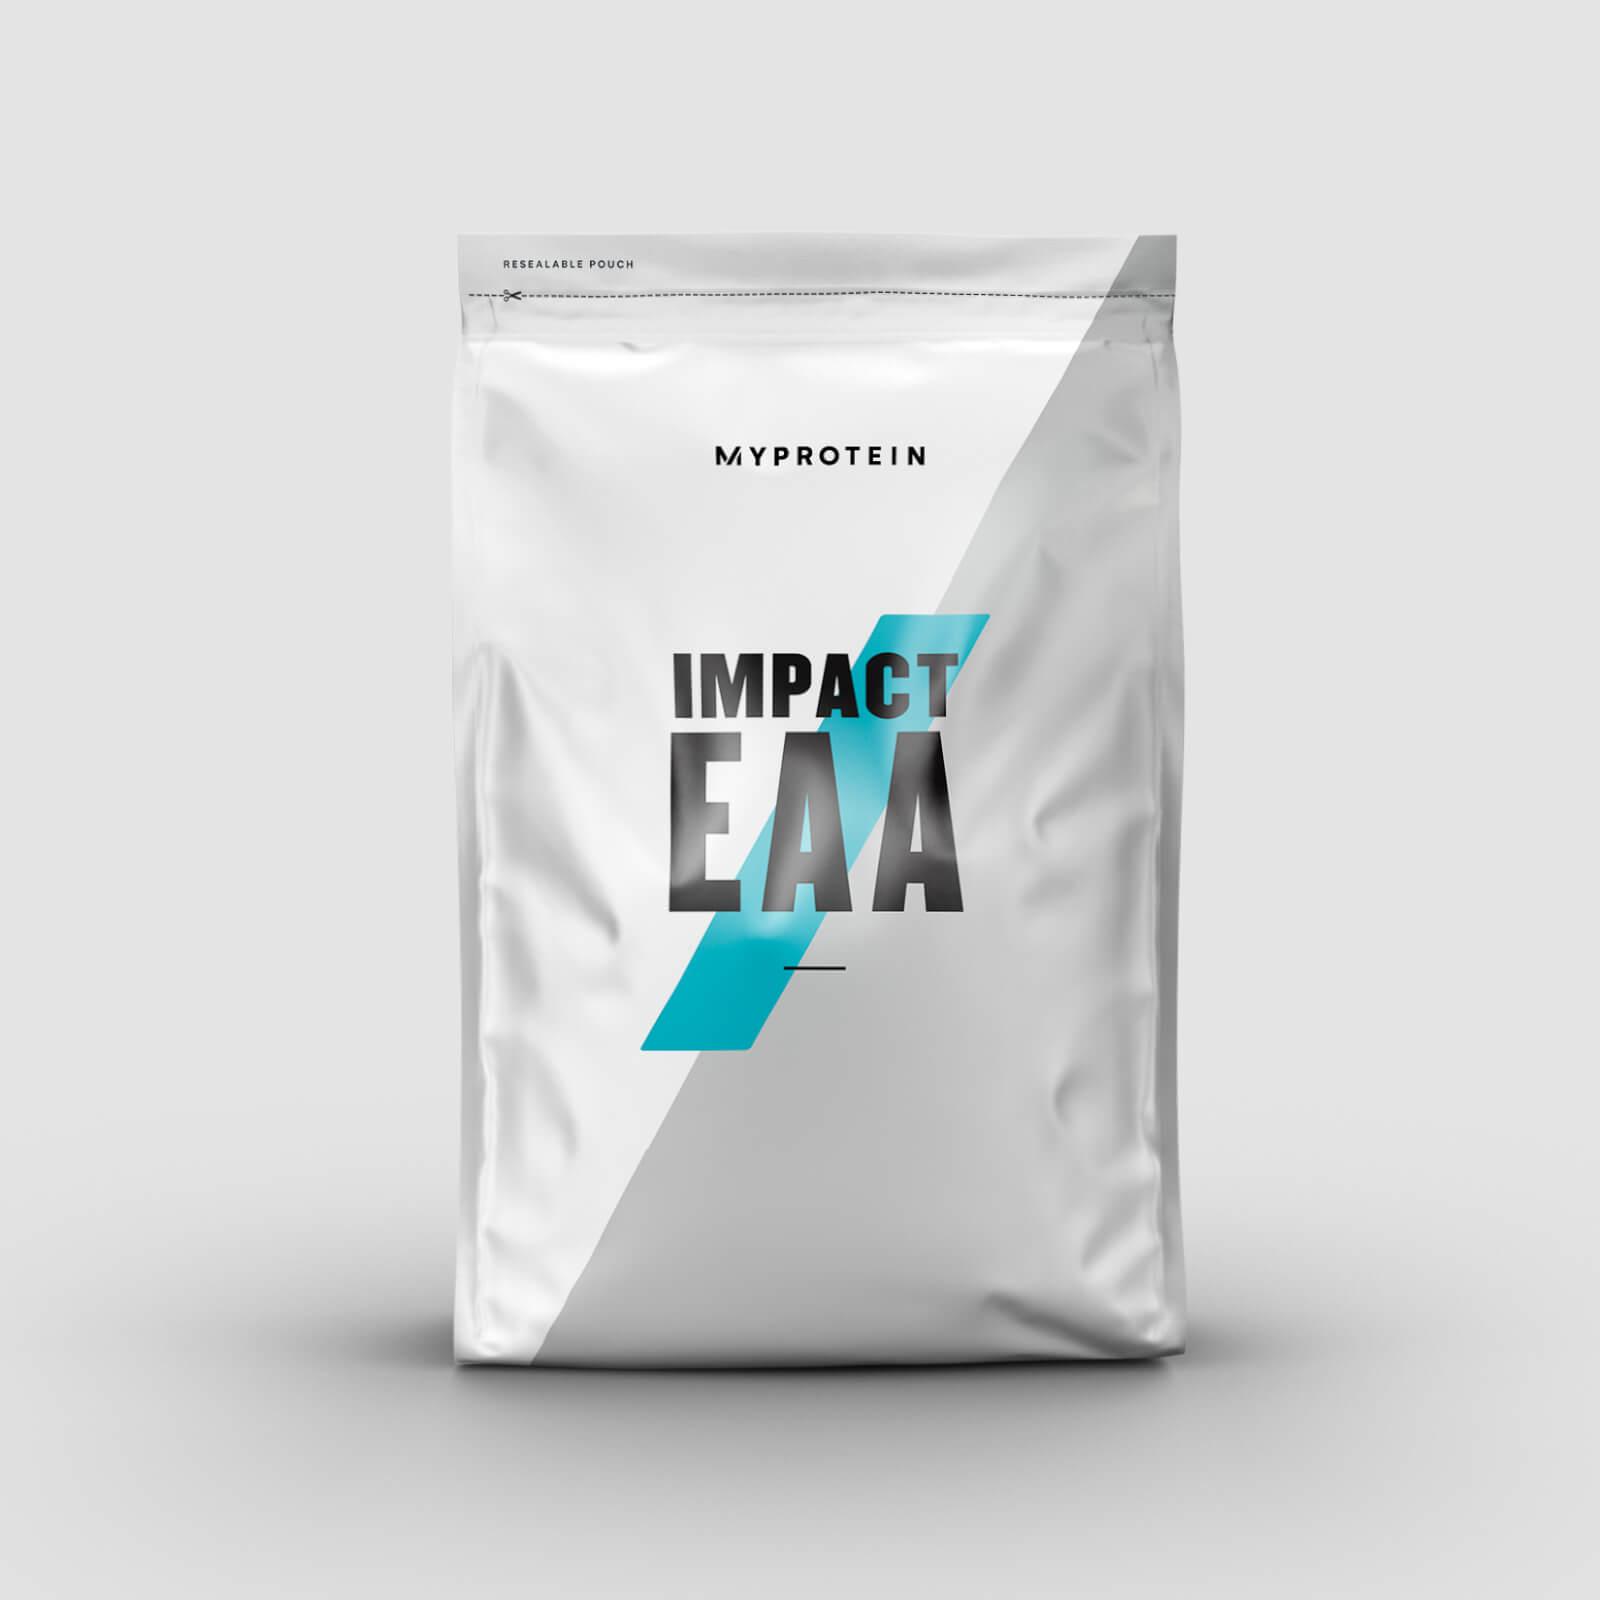 Myprotein Impact EAA - 1kg - Sans arôme ajouté